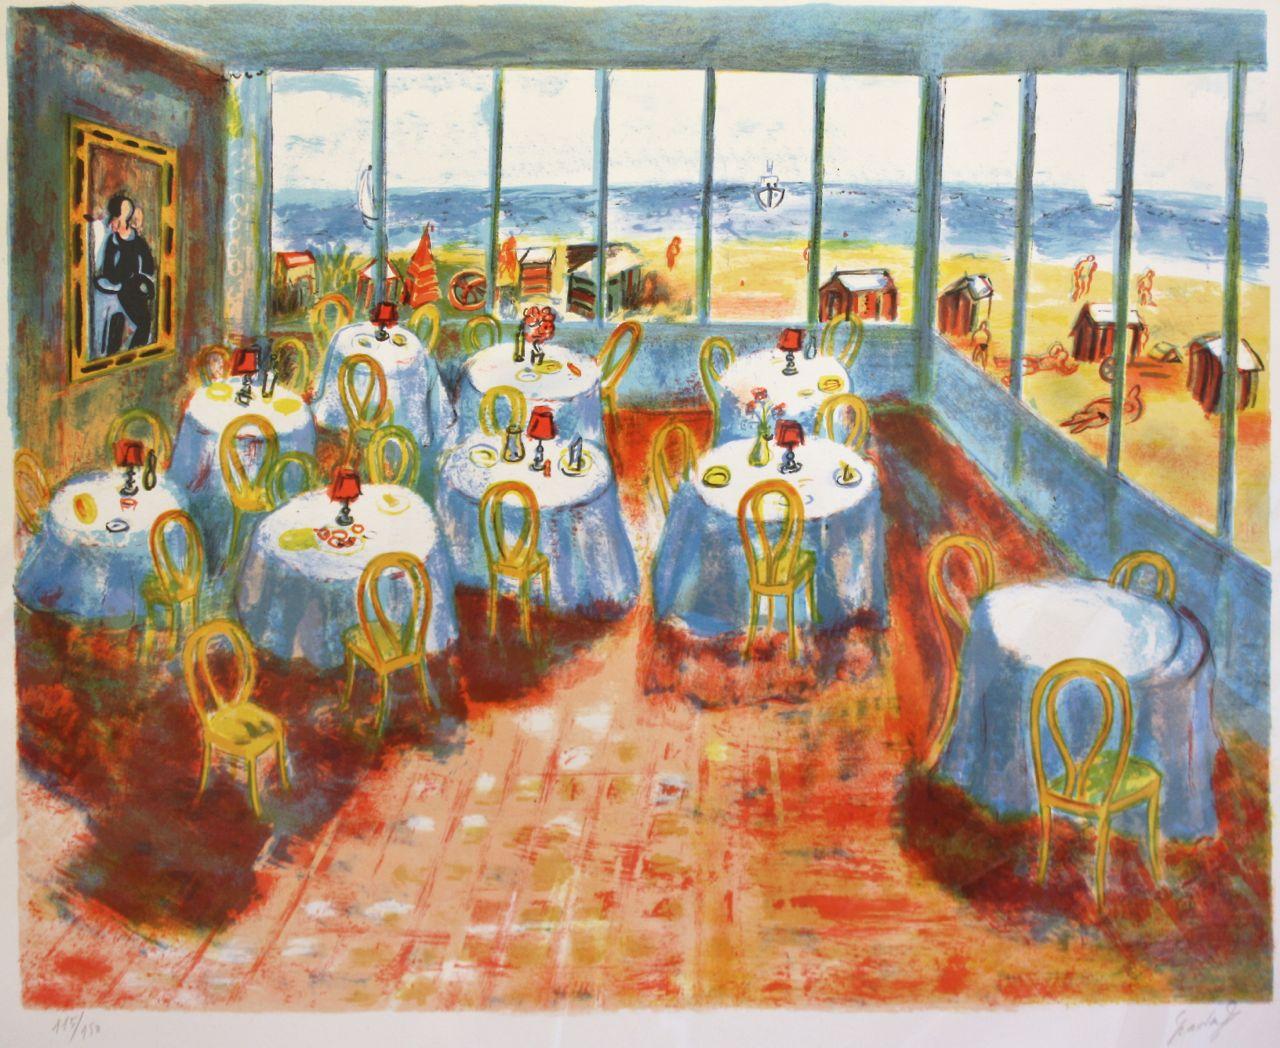 Art History News: Modern Times: American Art 1910-1950